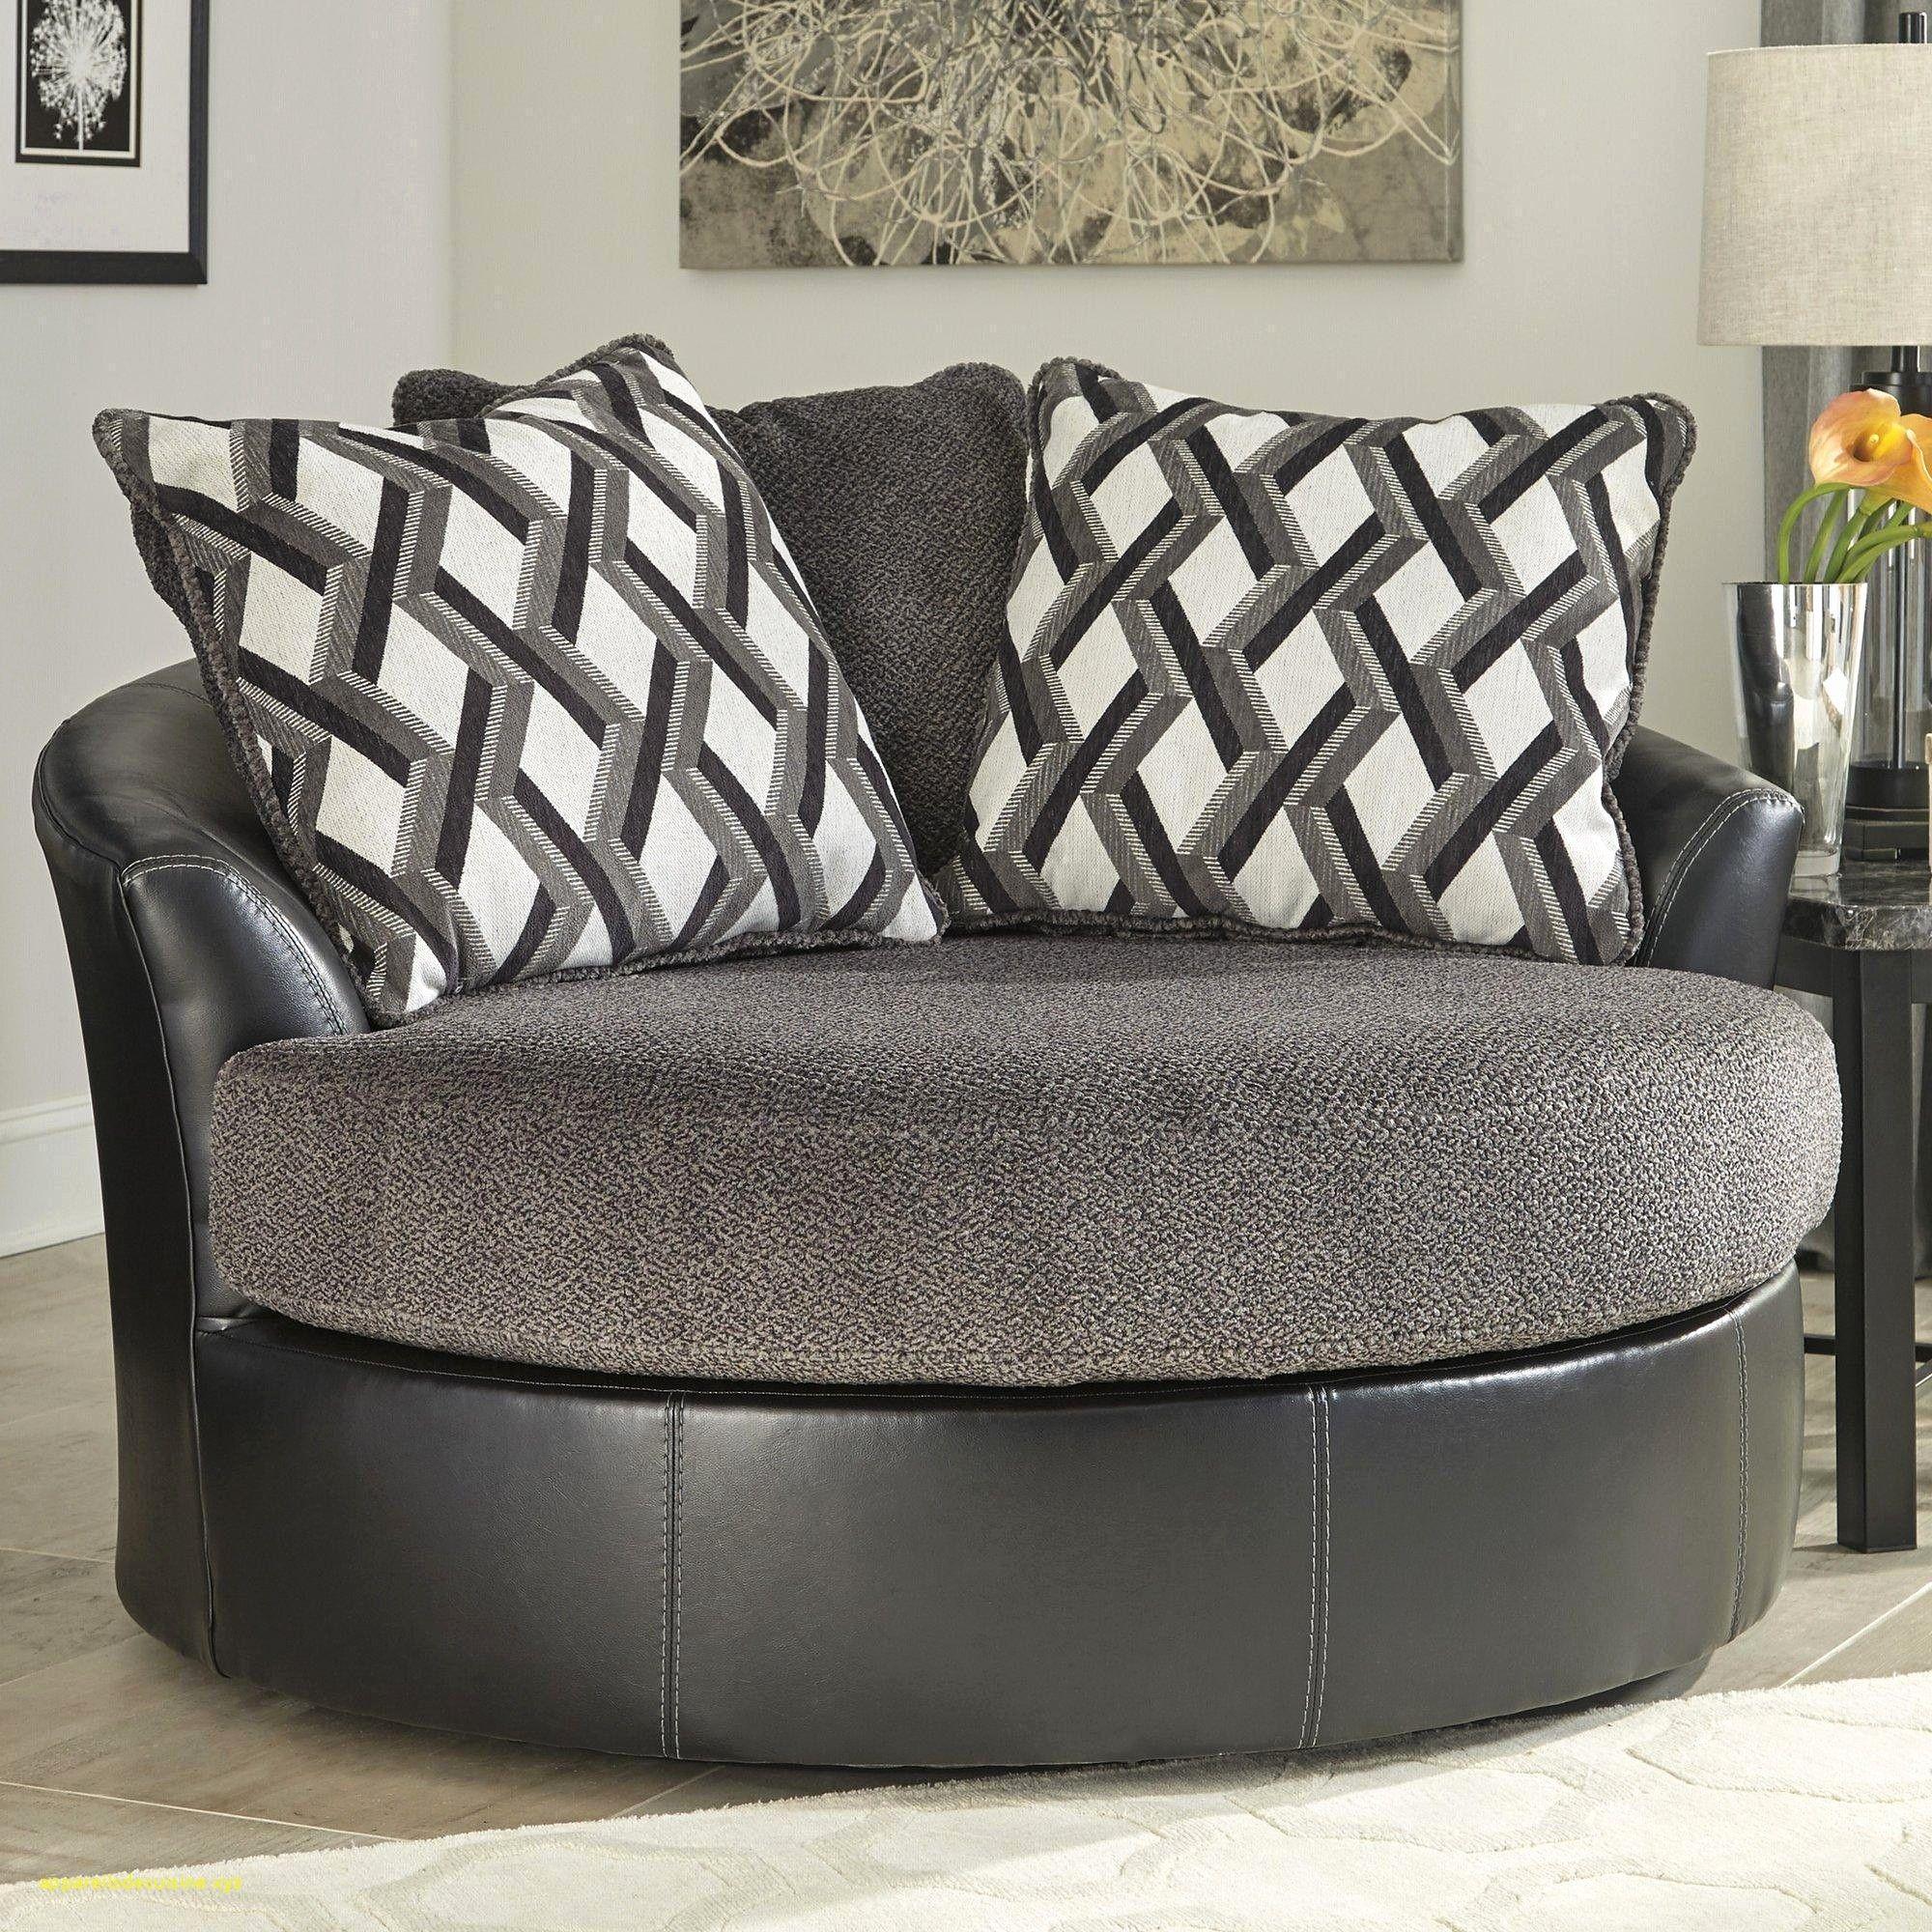 22 Neue Lazy Boy Dexter Sofa Sofa Chaiselongue Sofa